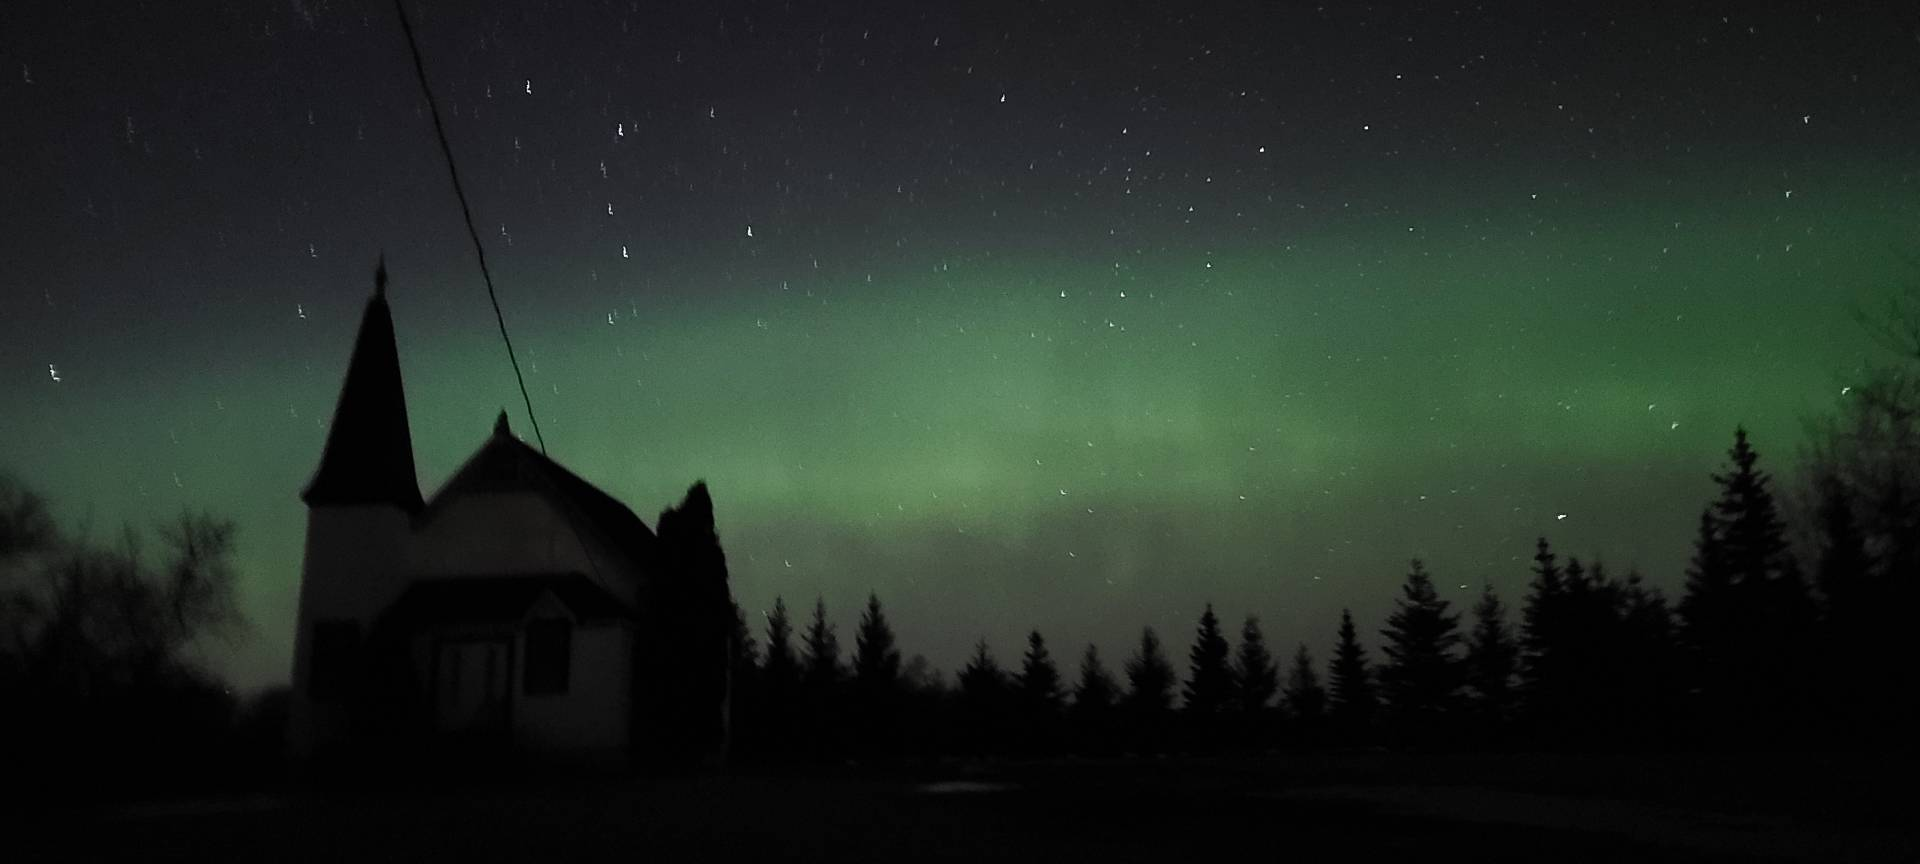 Aurora is shining brighter! 10:19pm